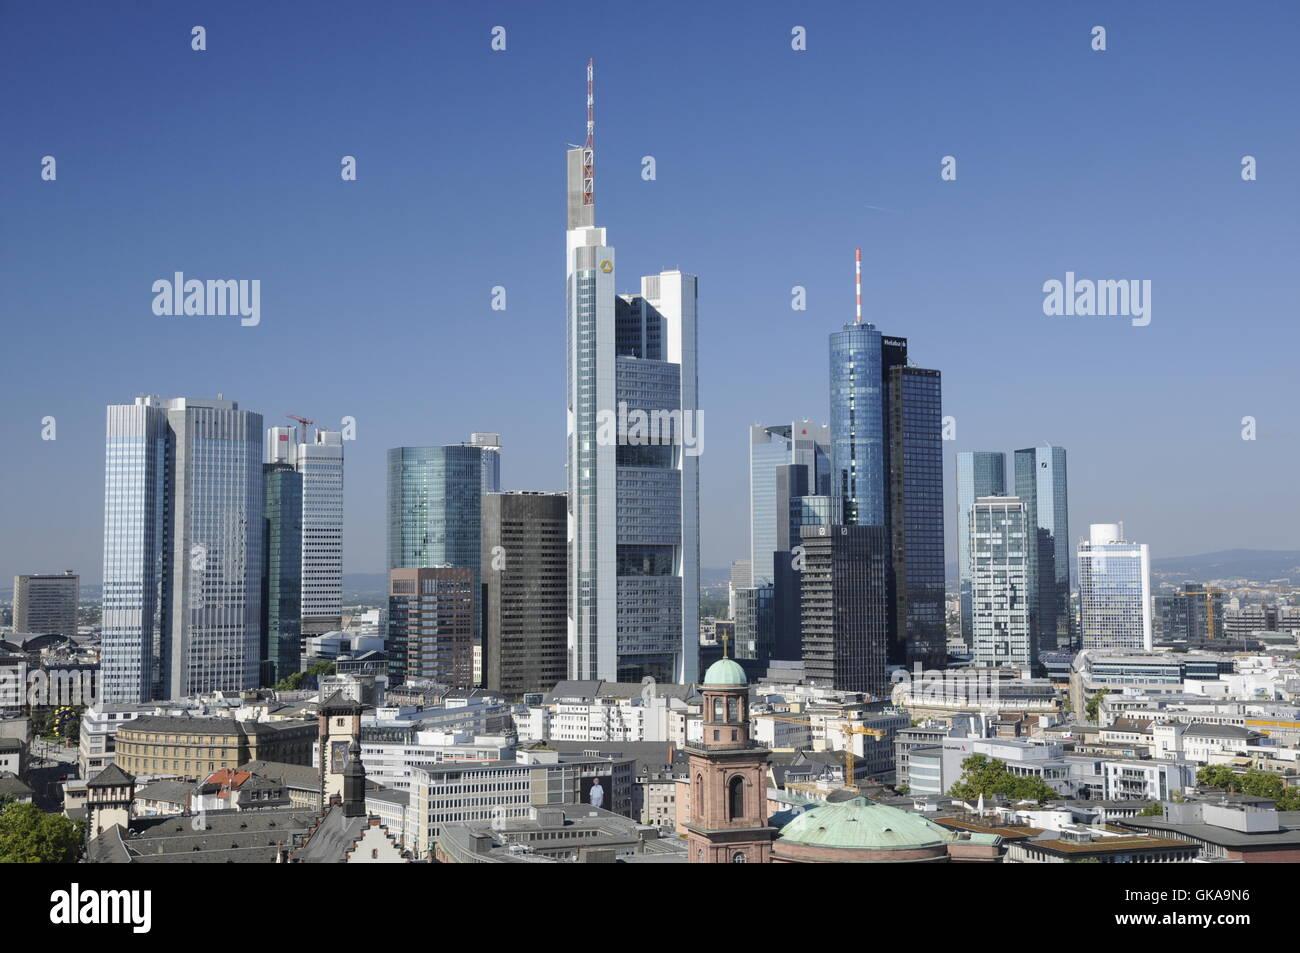 house multistory building multistorey building - Stock Image